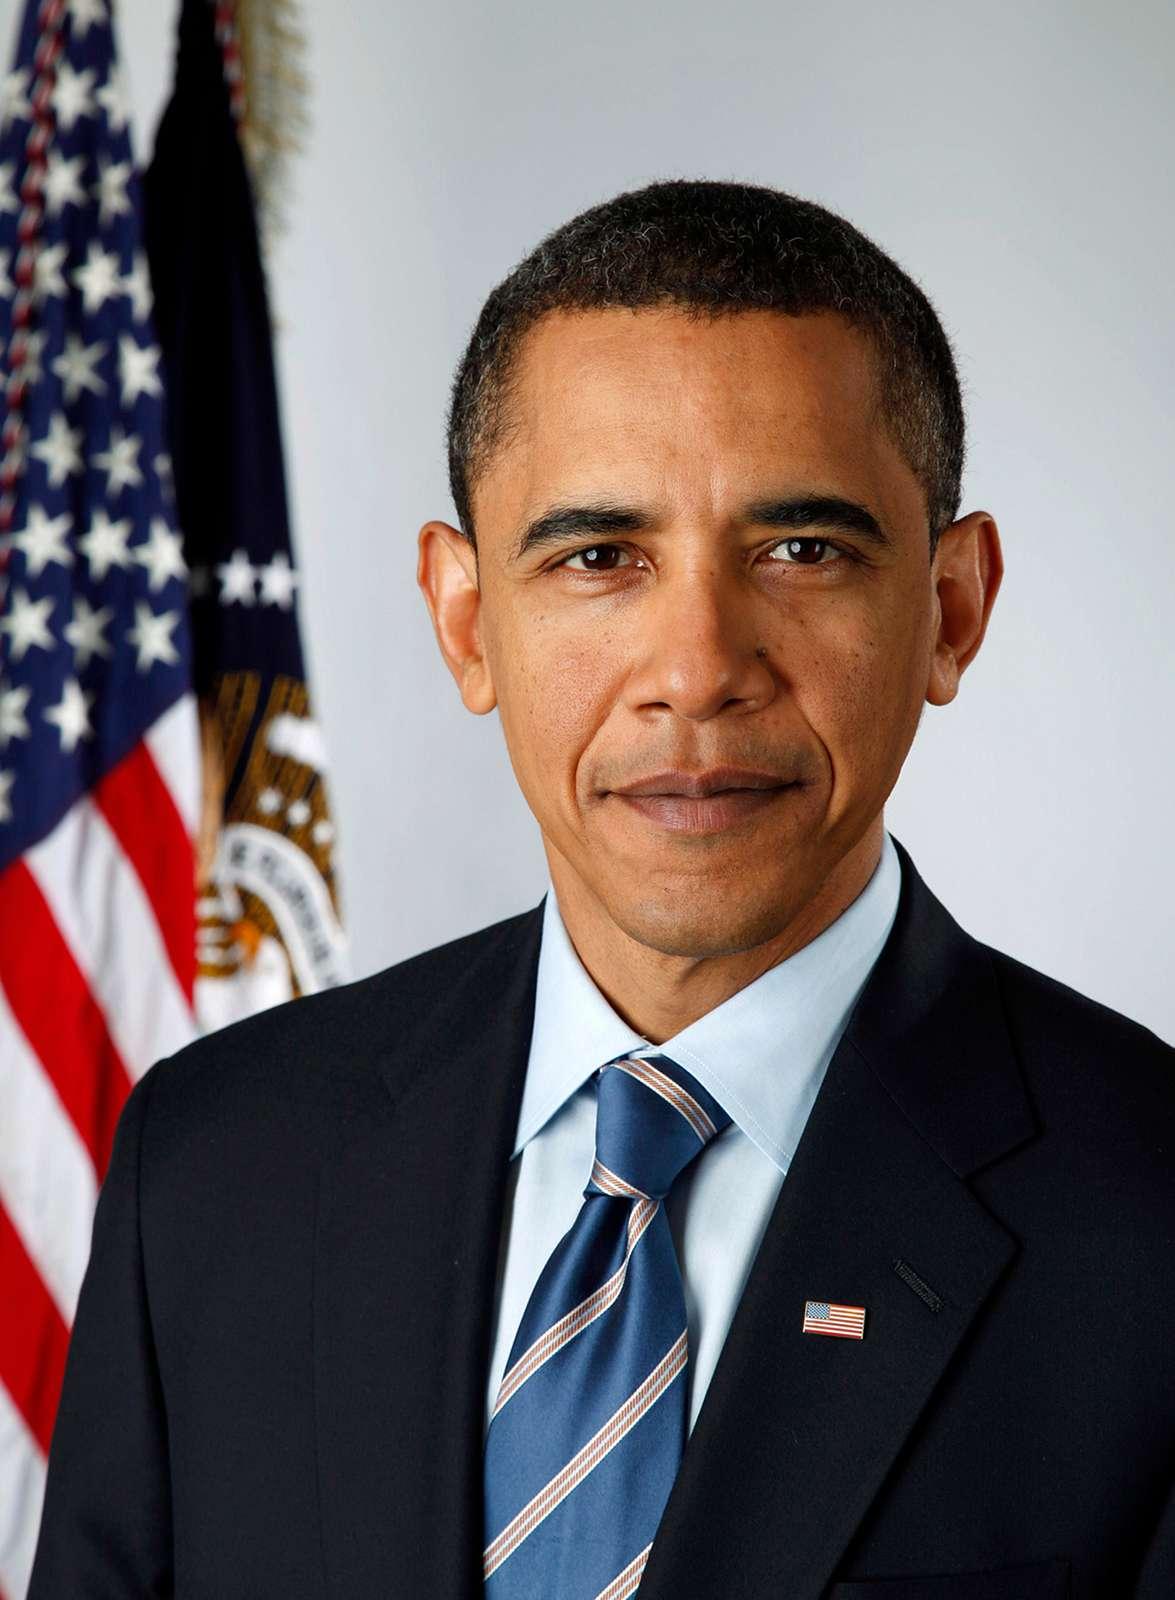 Official portrait of President-elect Barack Obama / Pete Souza.